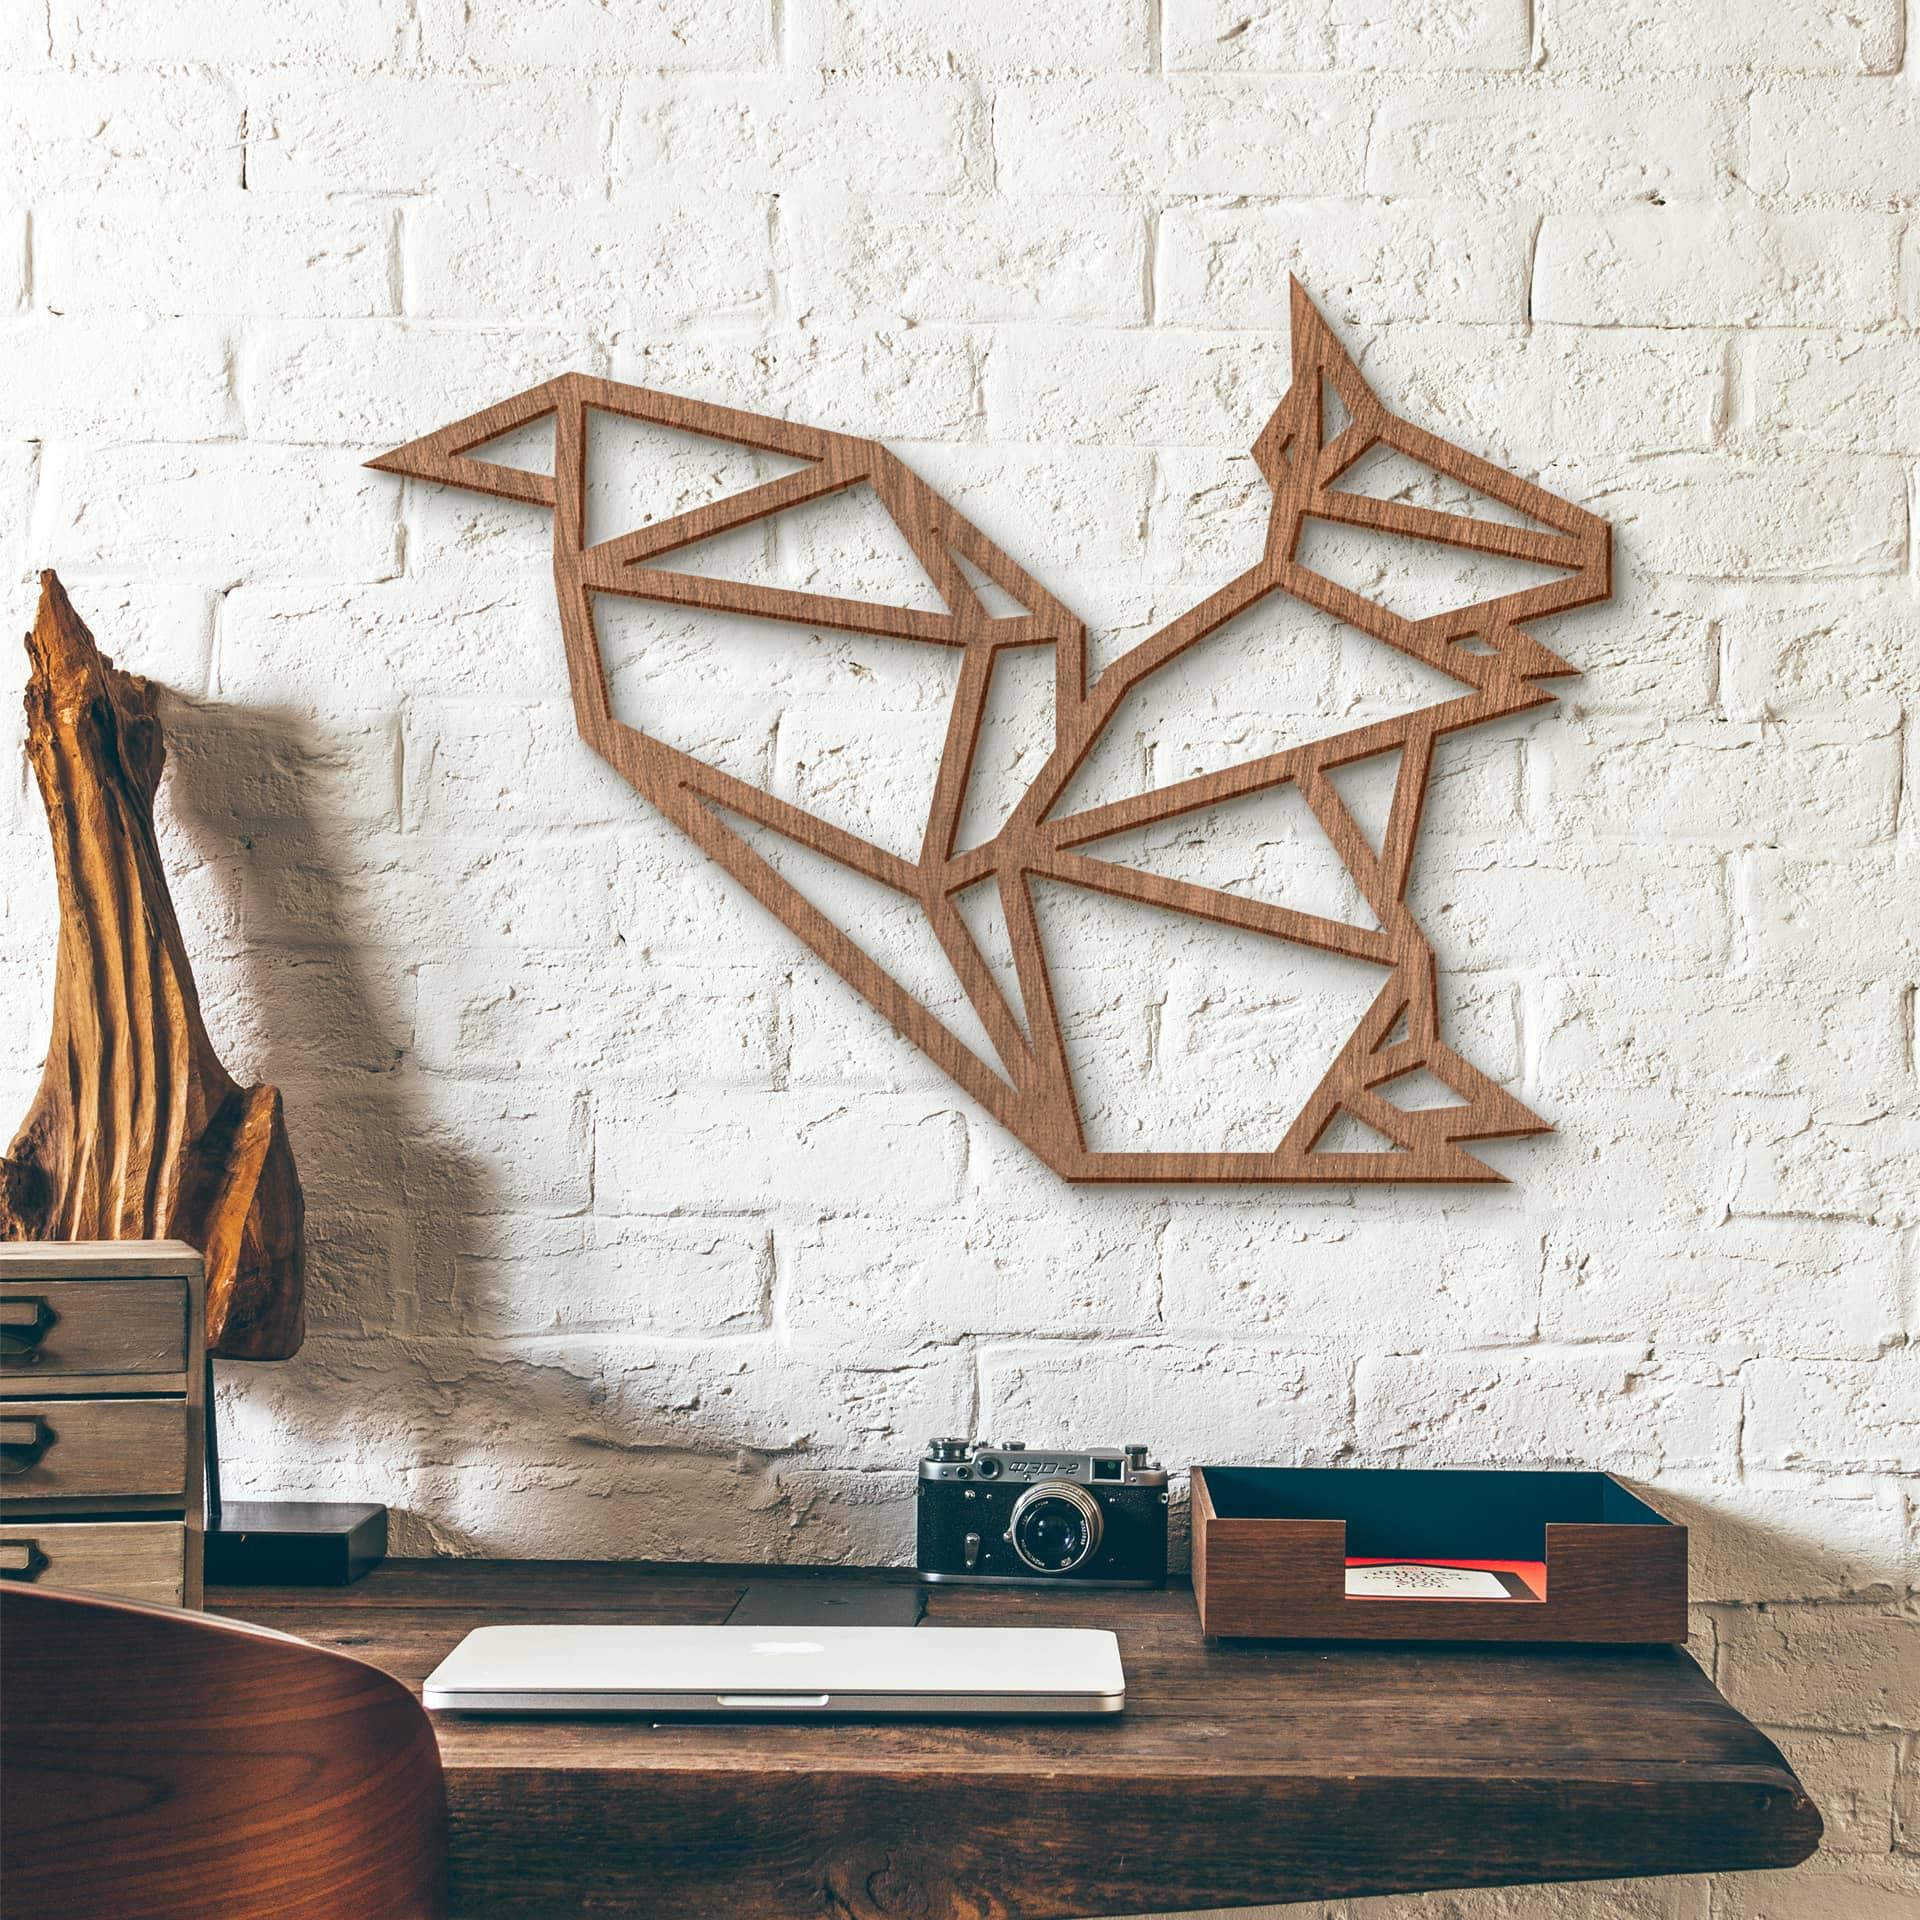 Holzkunst mahagoni origami eichh rnchen wanddeko for Origami zimmer deko